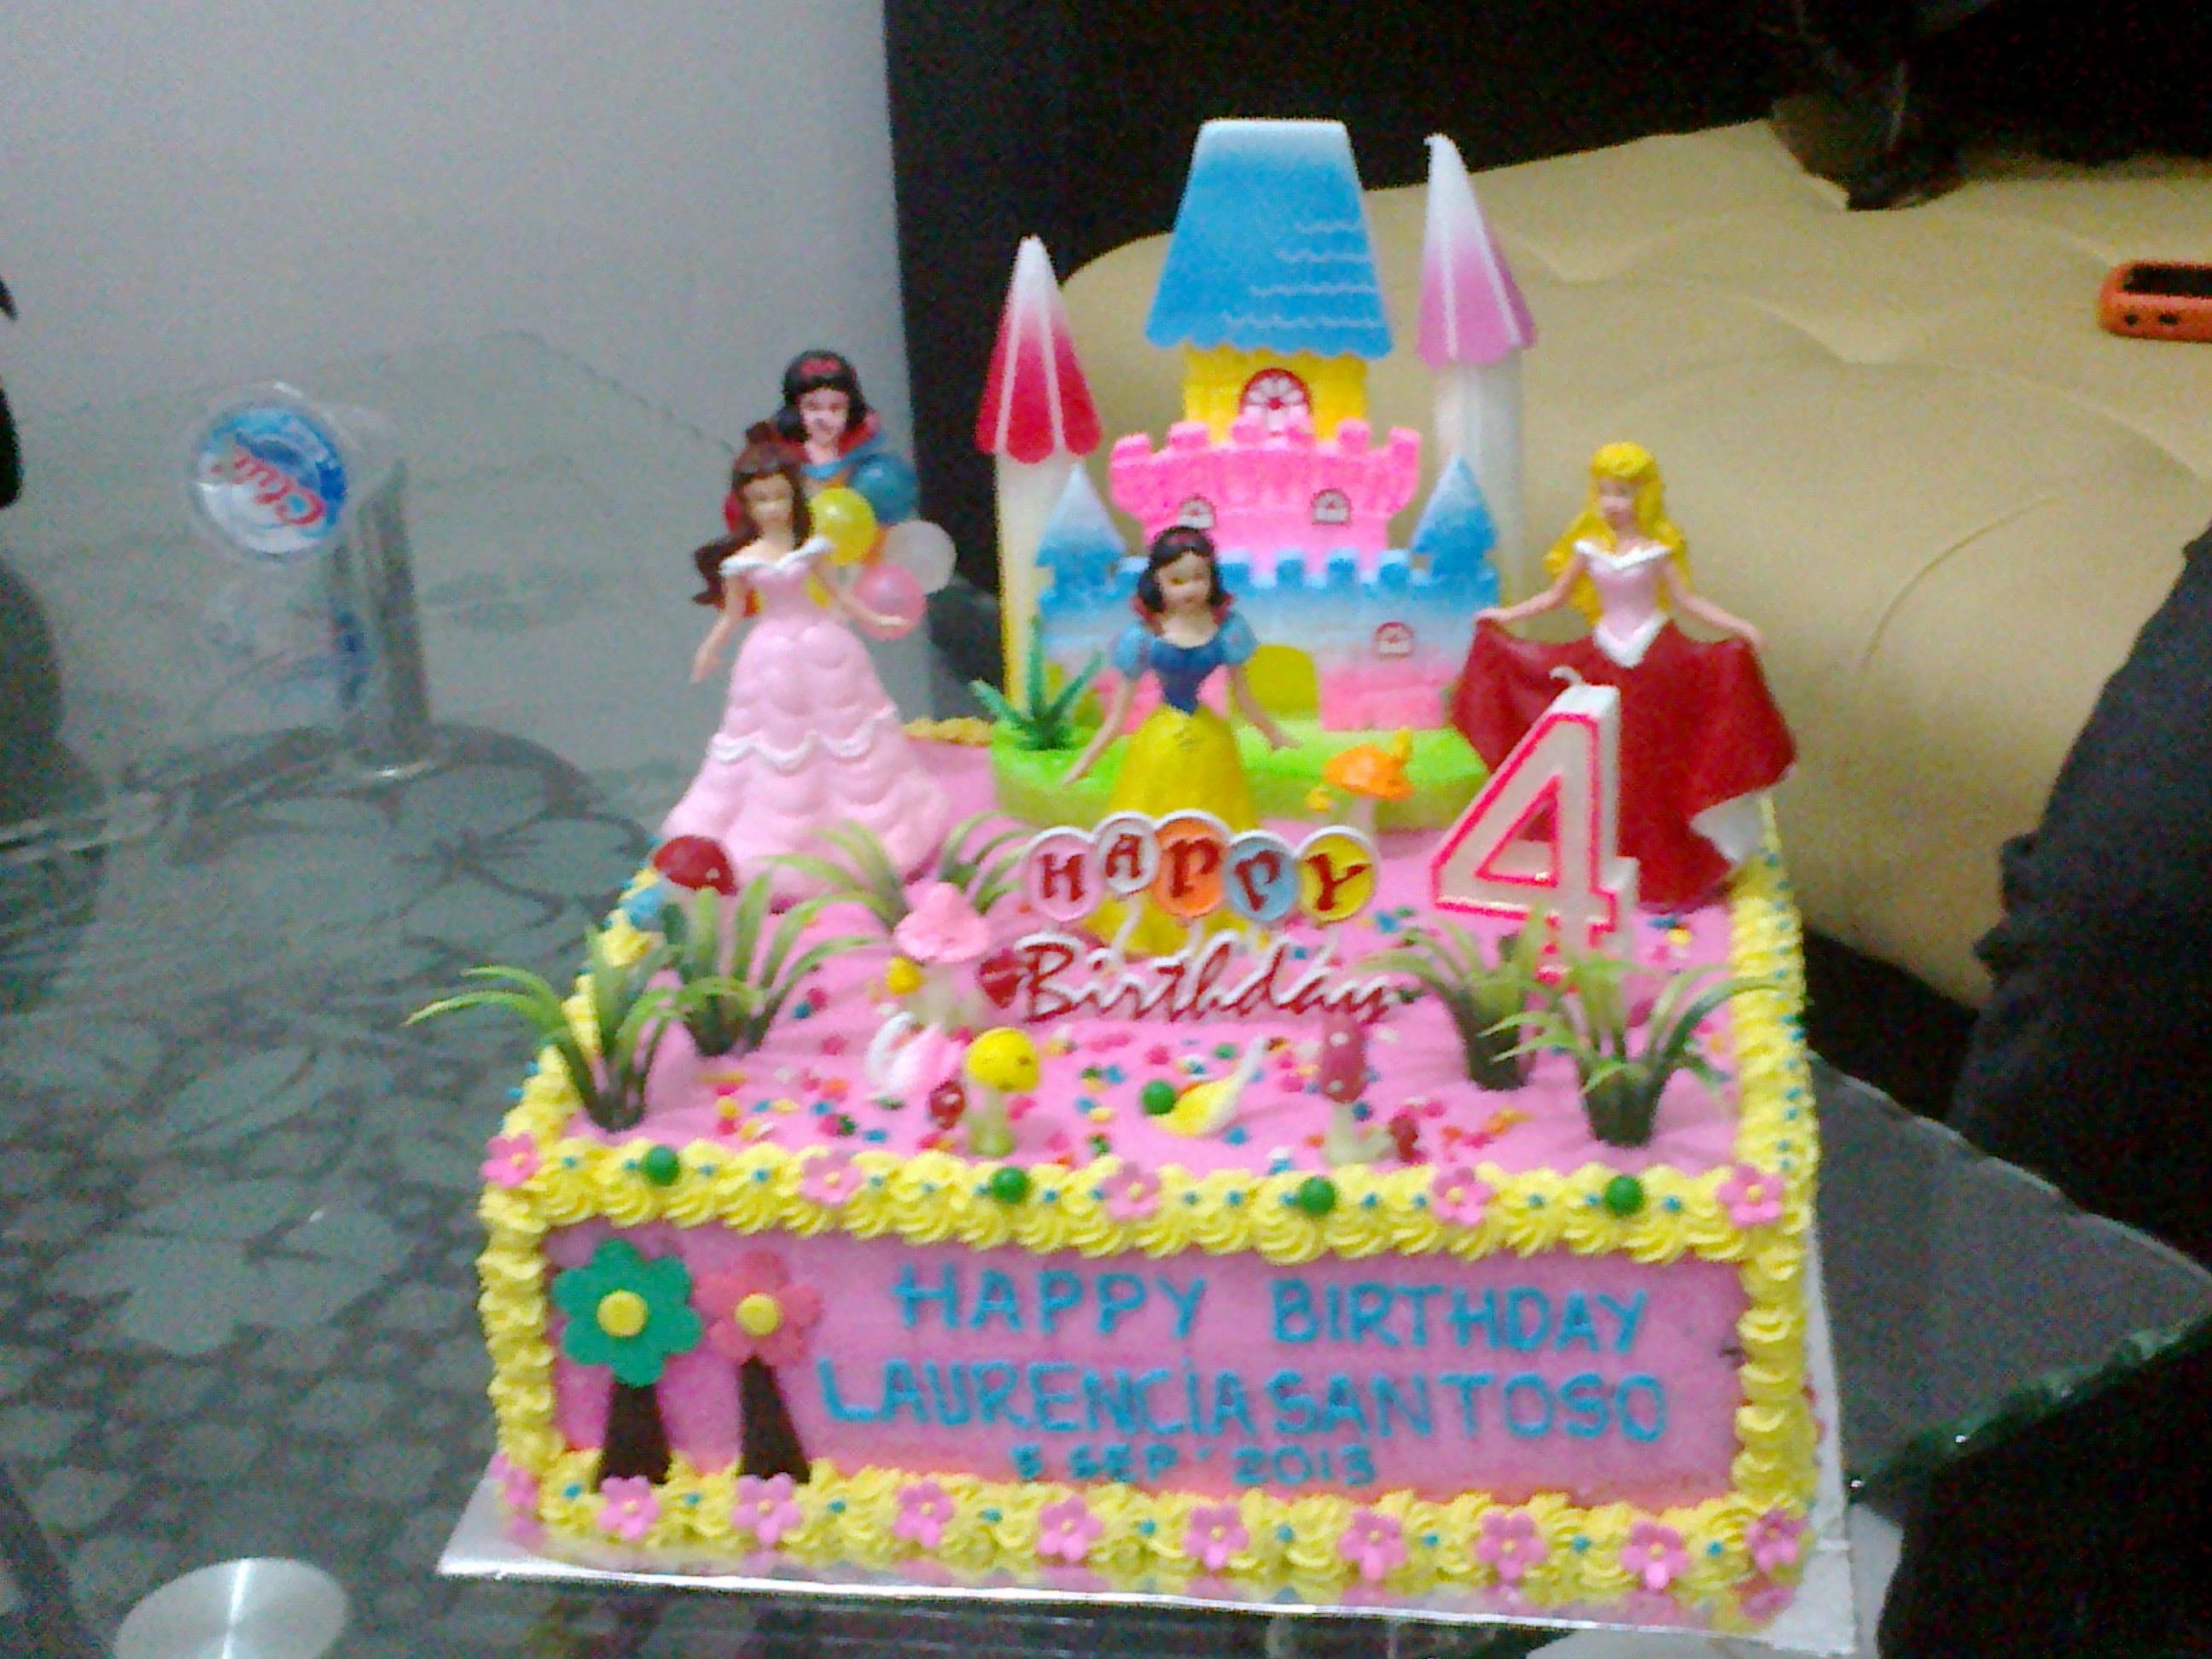 Kuetart Ulang Tahun Jual Kue Ulang Tahun Kue Ultah Anak